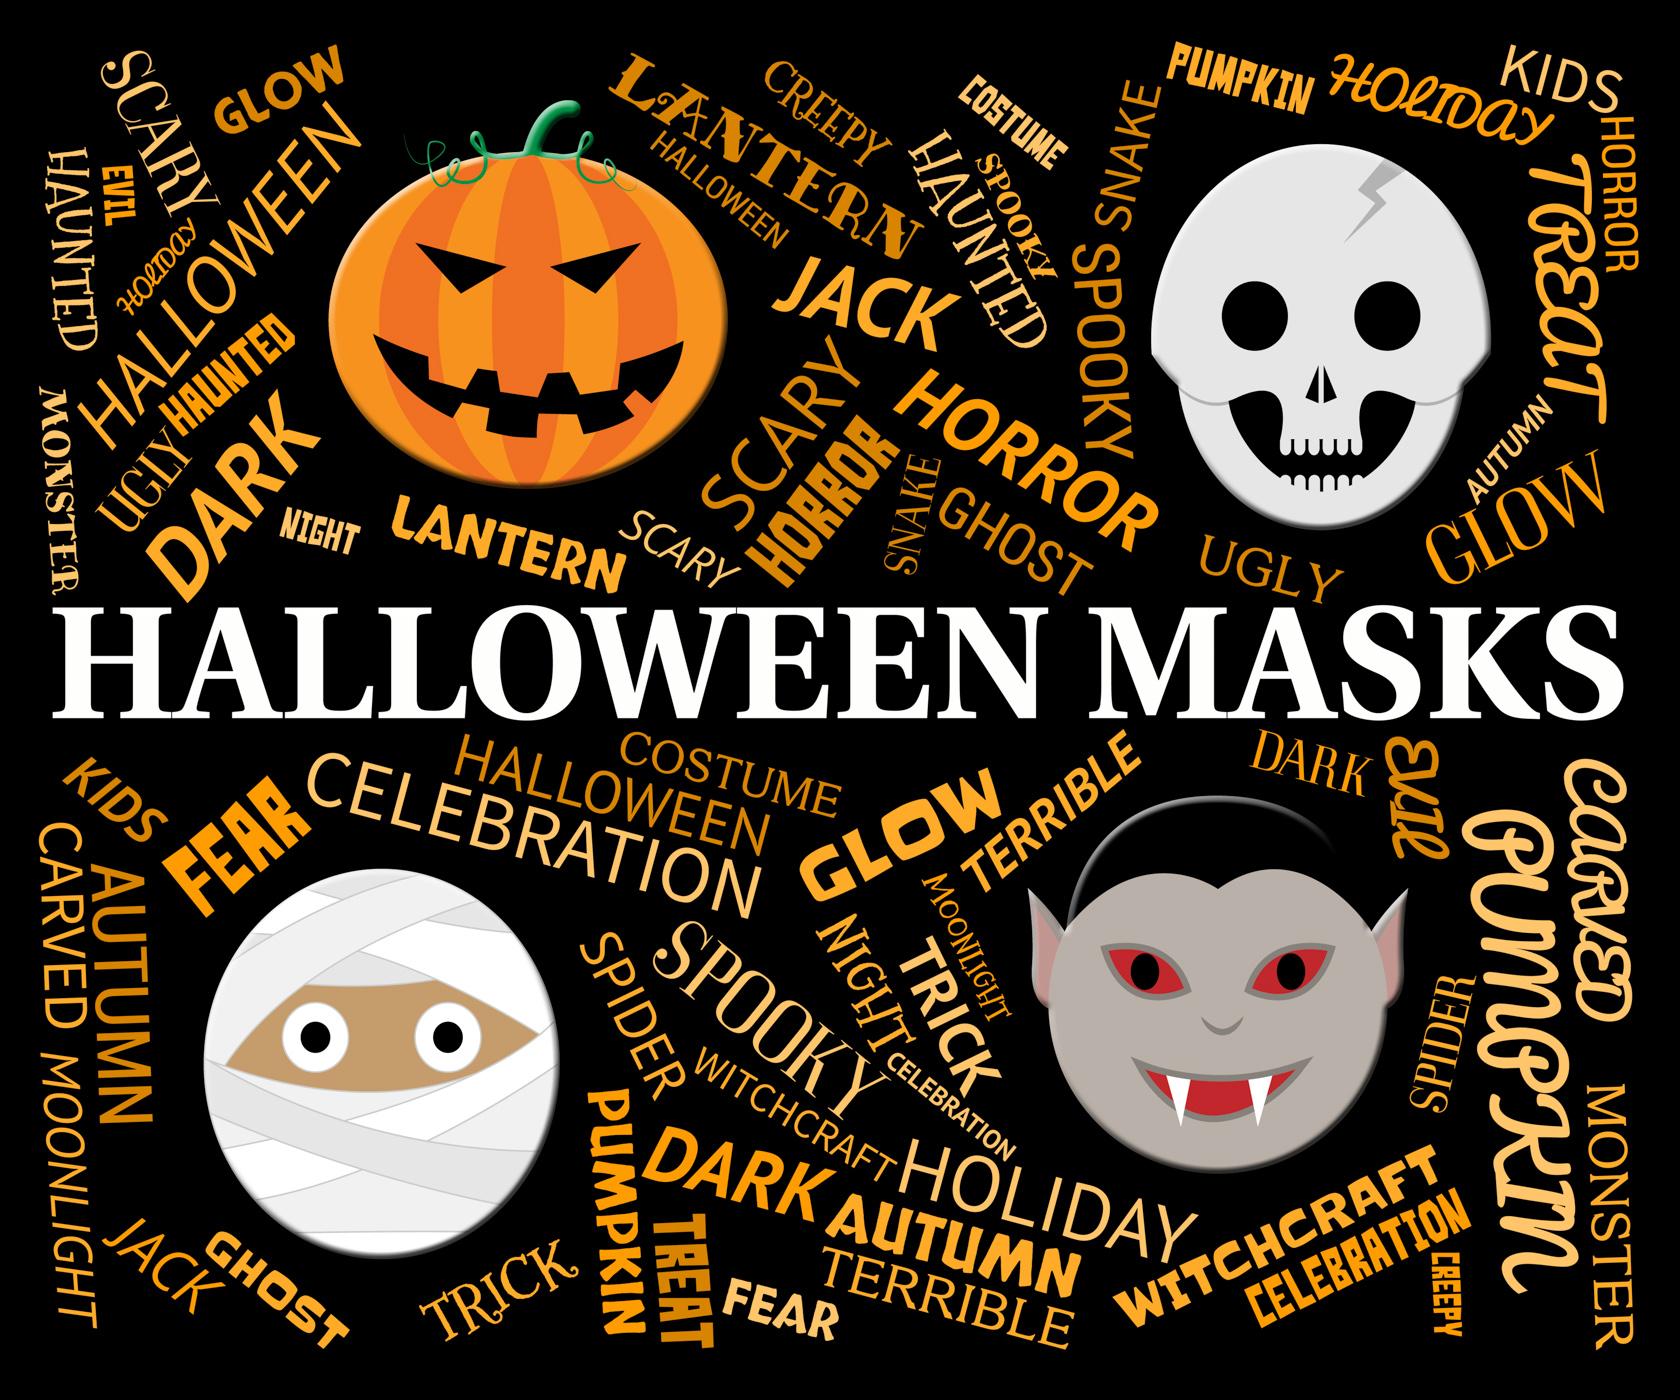 Halloween masks indicates trick or treat and celebration photo